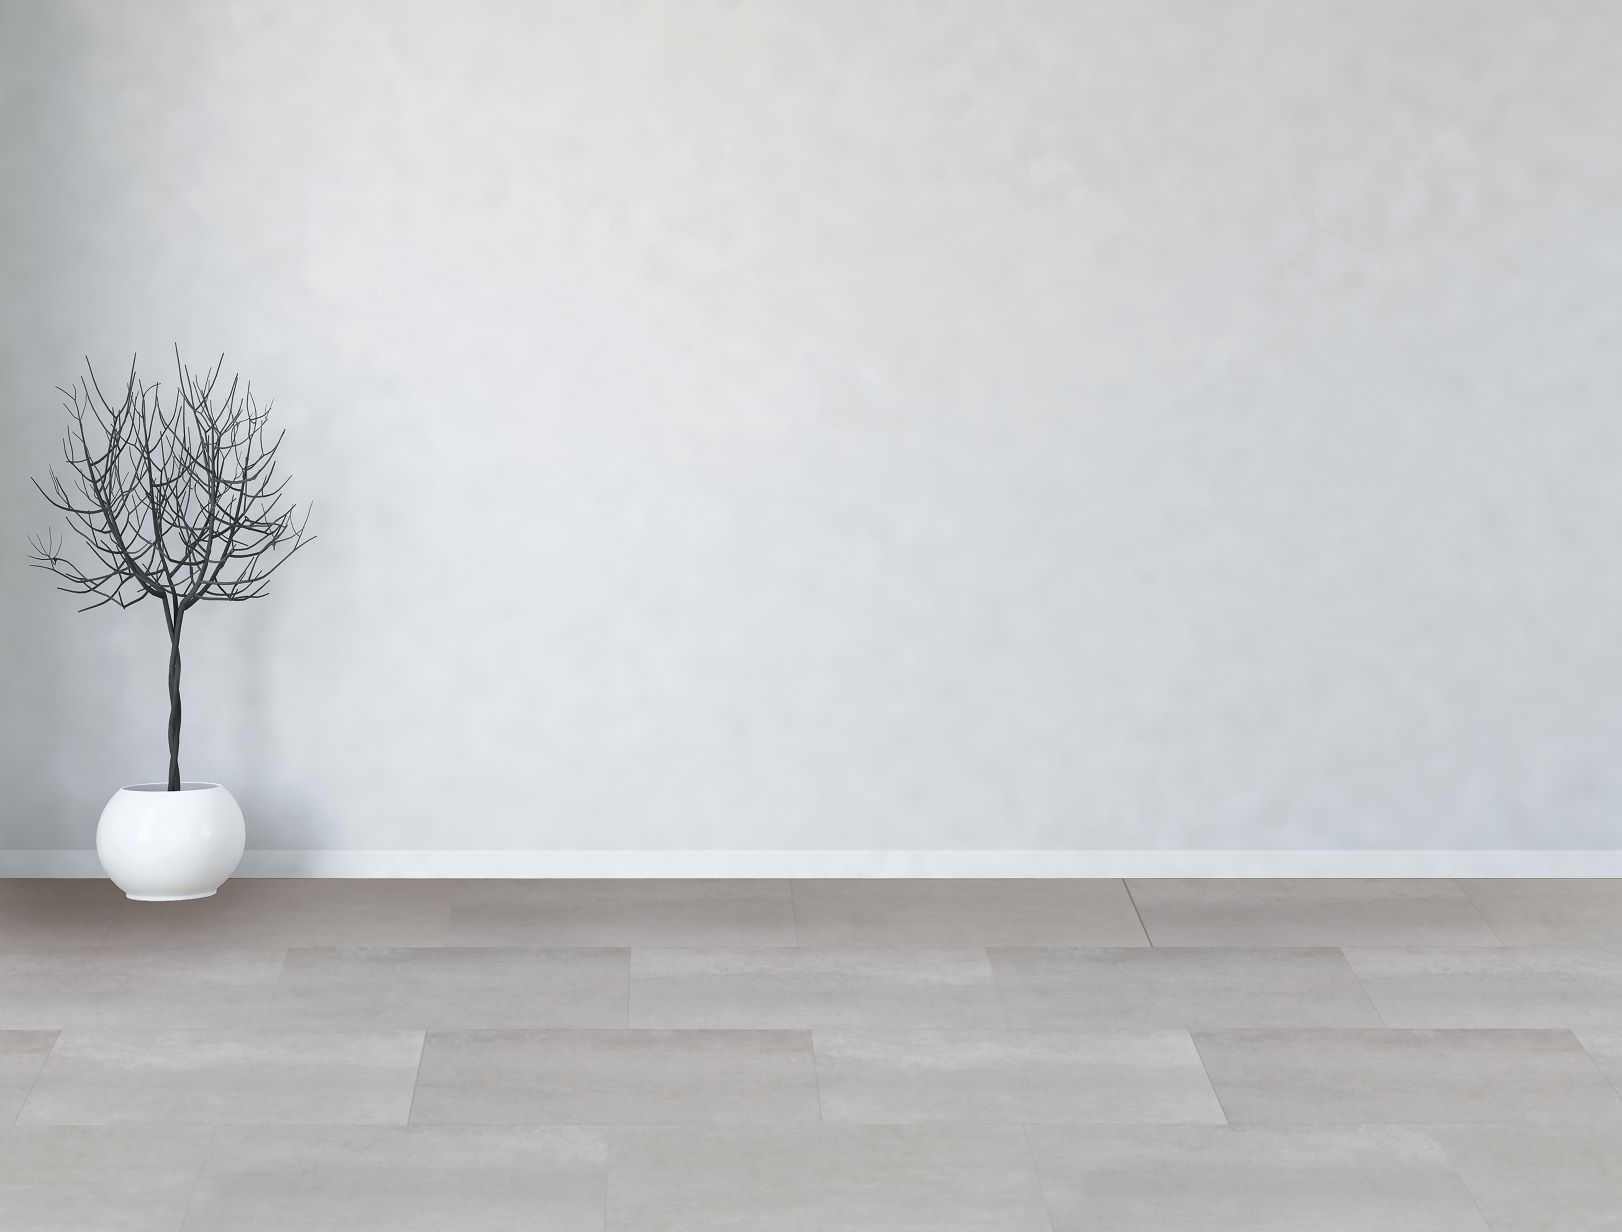 designclic extreme 0,5 stone marmor weiss mit integrierter